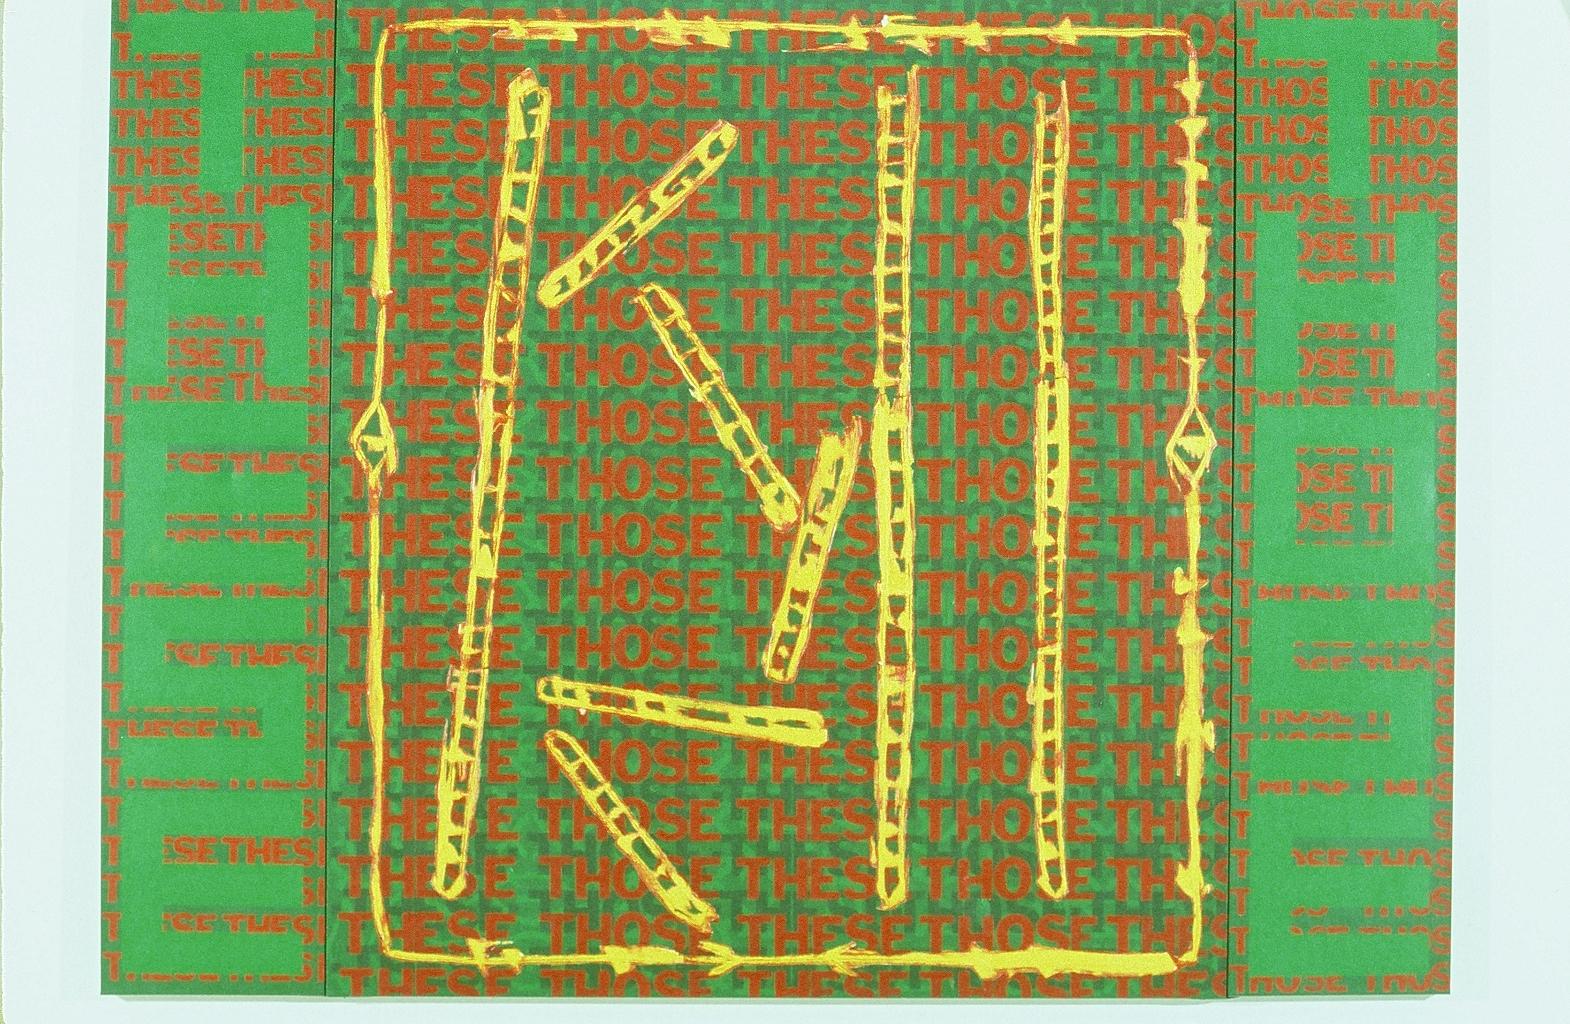 "These Those (Graffiti Series), 1992  72"" x 96""  Acrylic on canvas"